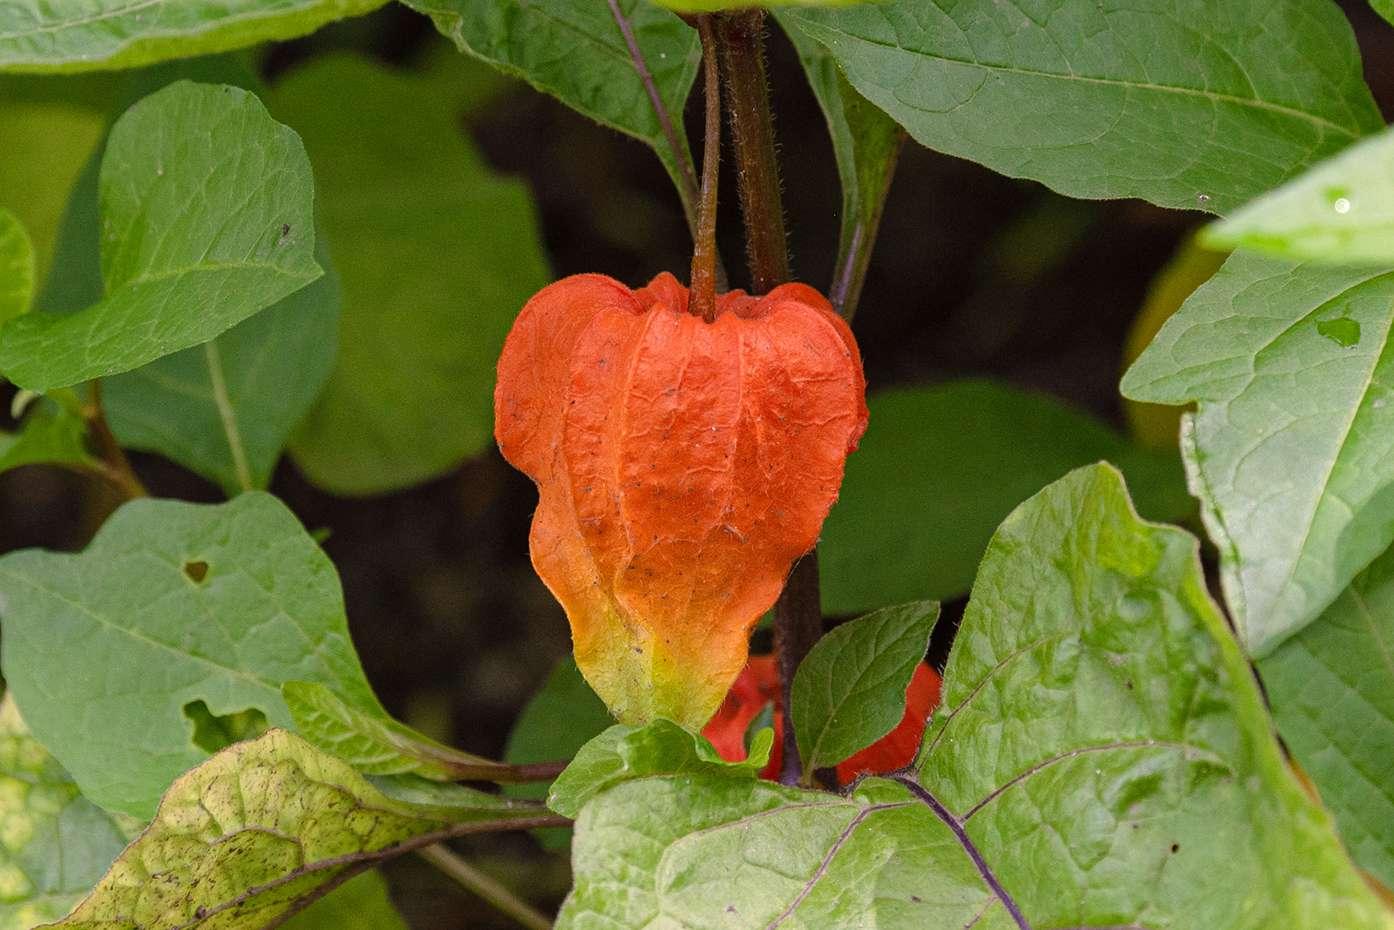 Chinese lantern plant with orange papery seed pod hanging closeup